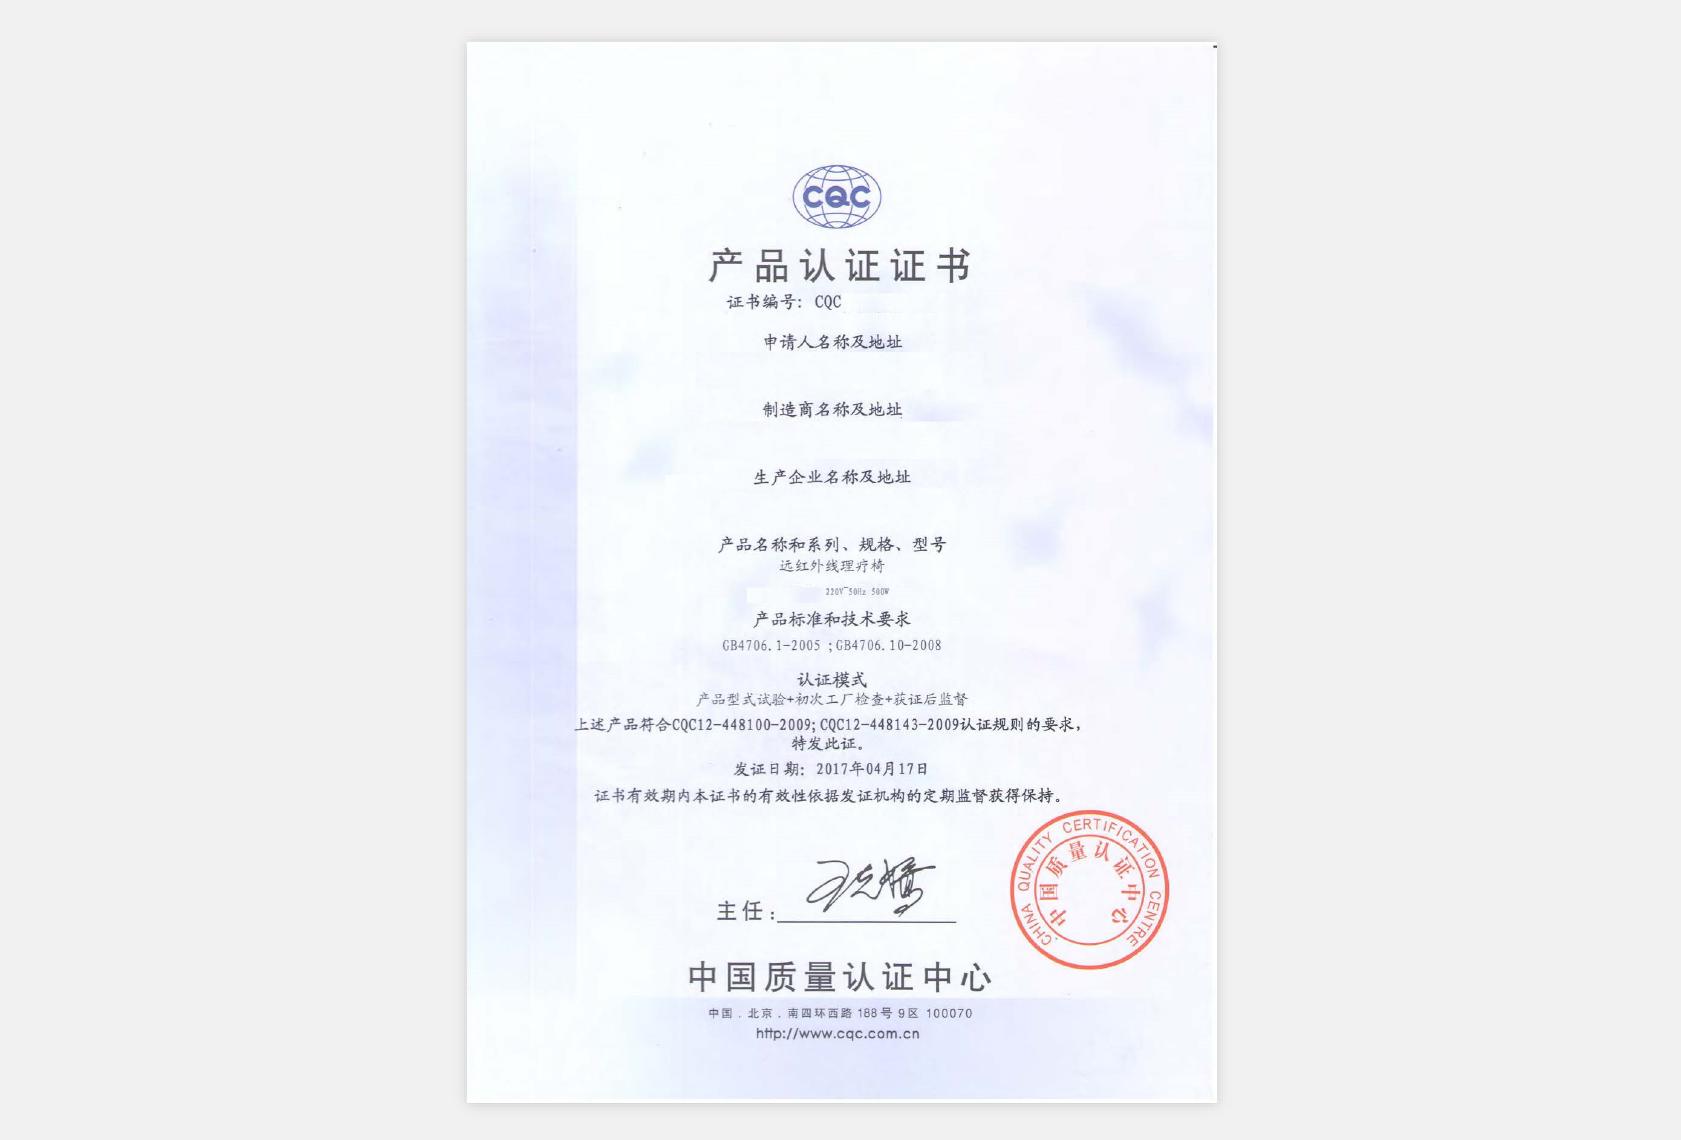 CQC标志认证证书